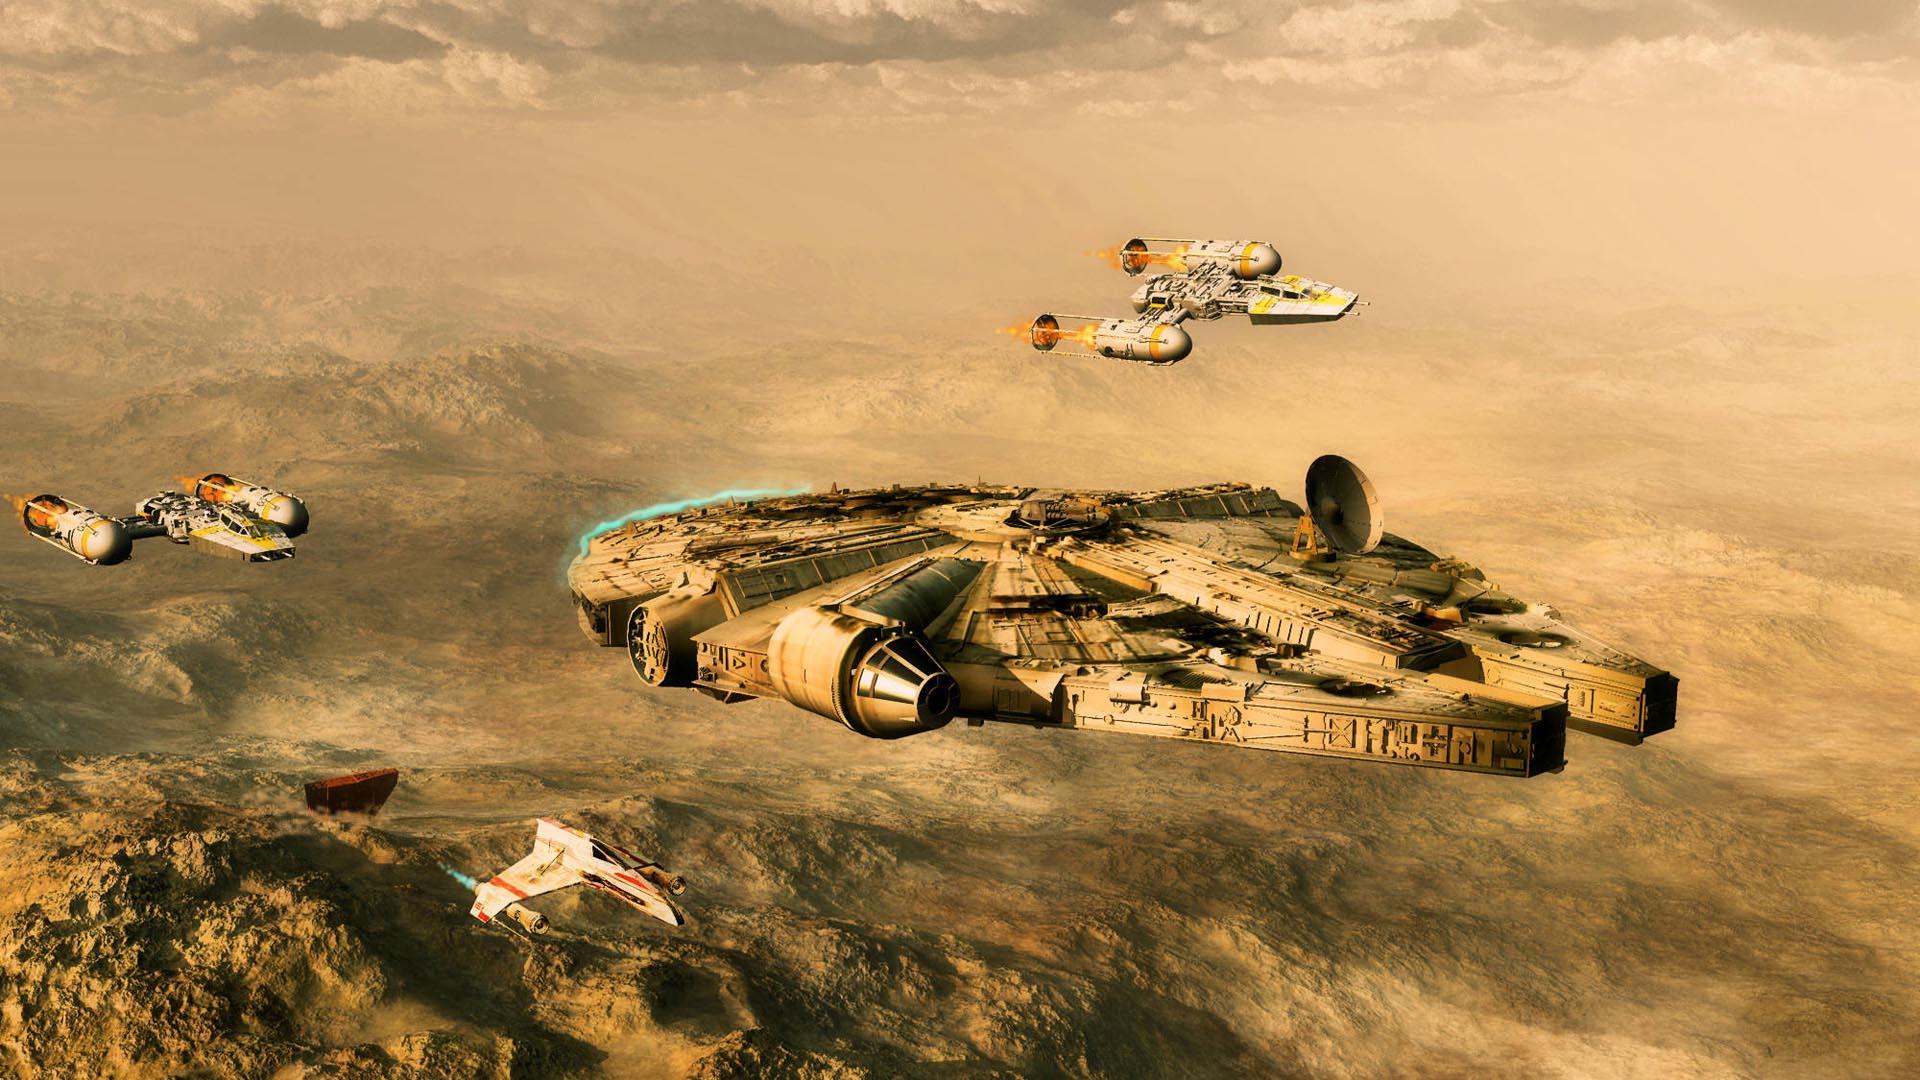 Star Wars Millenium Falcon wallpapers HD   469685 1920x1080